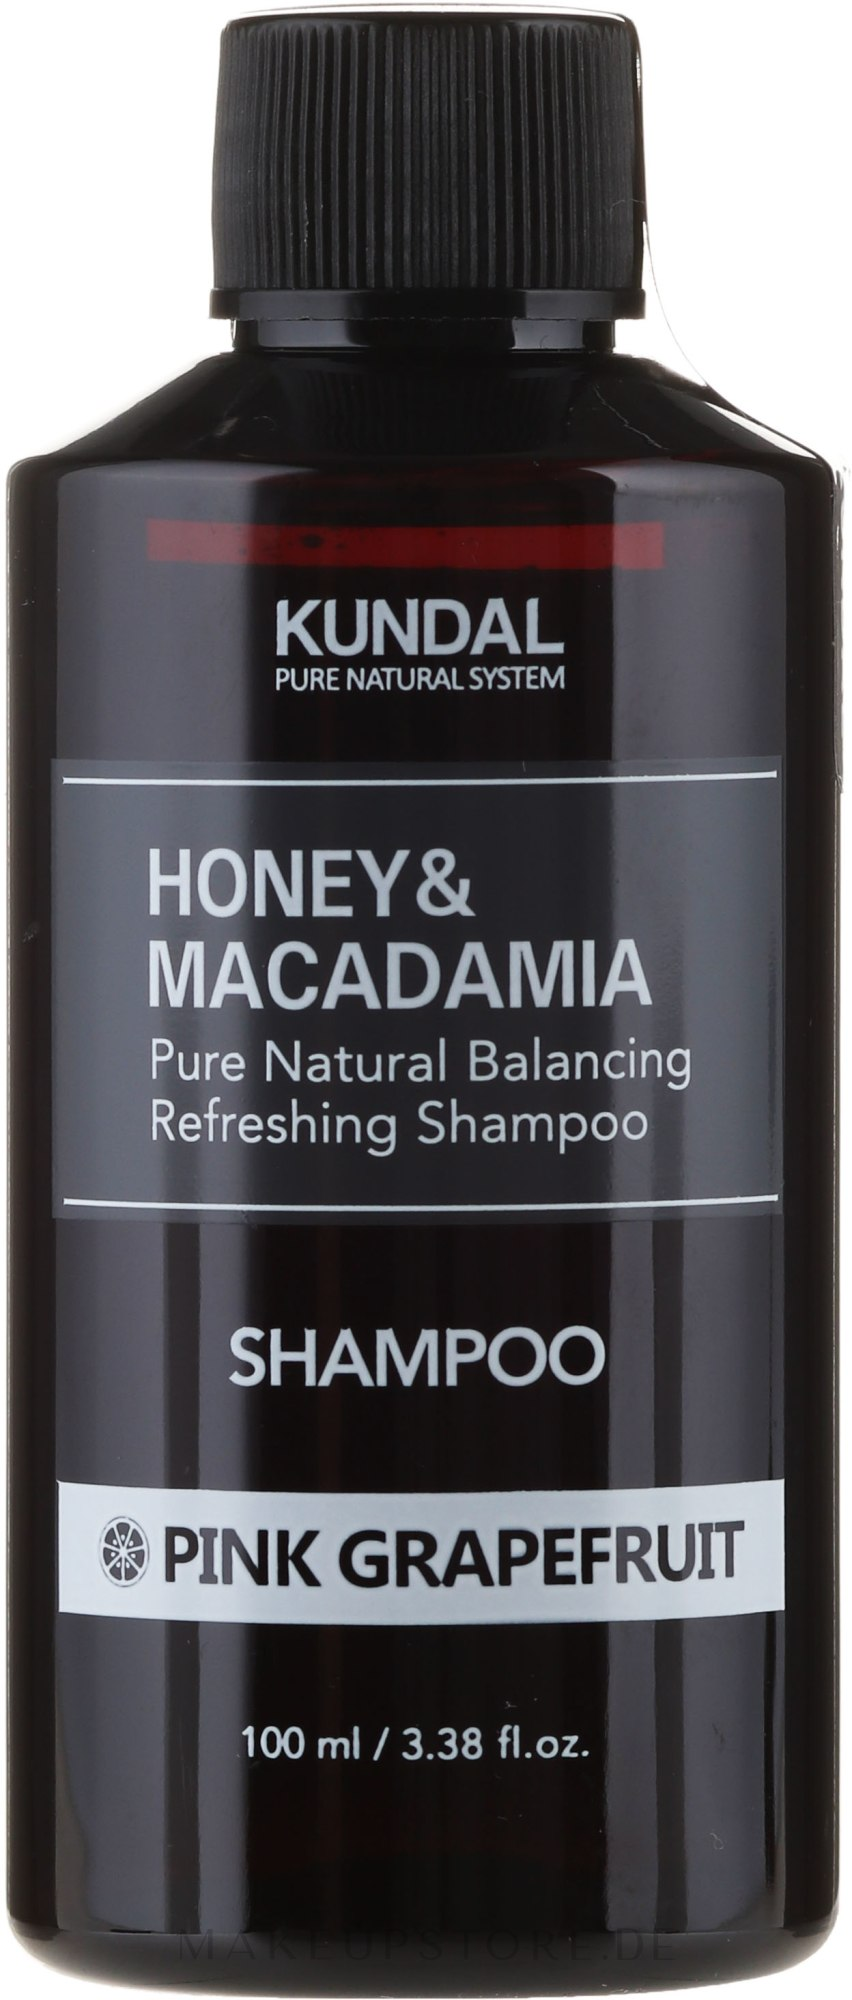 Erfrischendes Shampoo mit rosa Grapefruit - Kundal Honey & Macadamia Pink Grapefruit Shampoo — Bild 100 ml